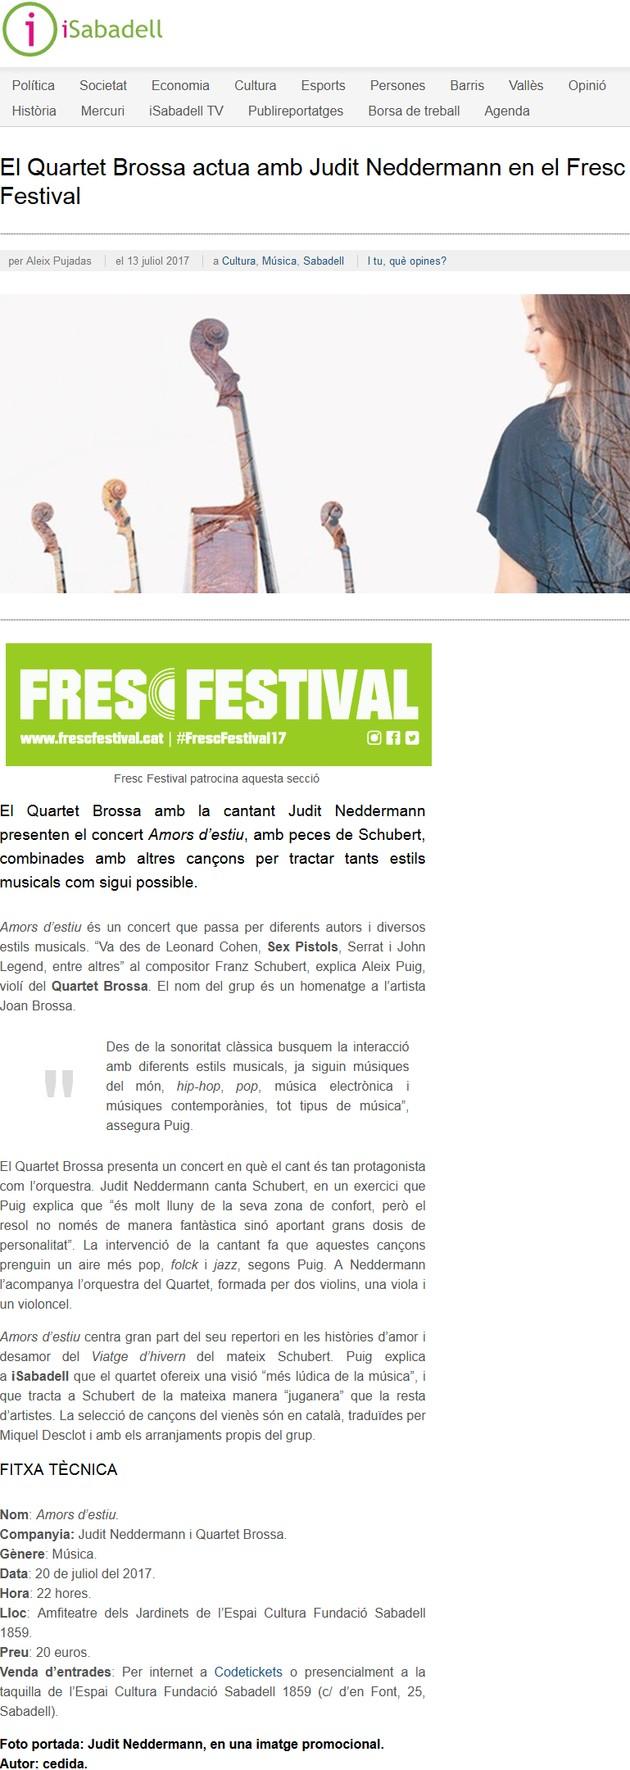 iSabadell: El Quartet Brossa actua amb Judit Neddermann en el Fresc Festival